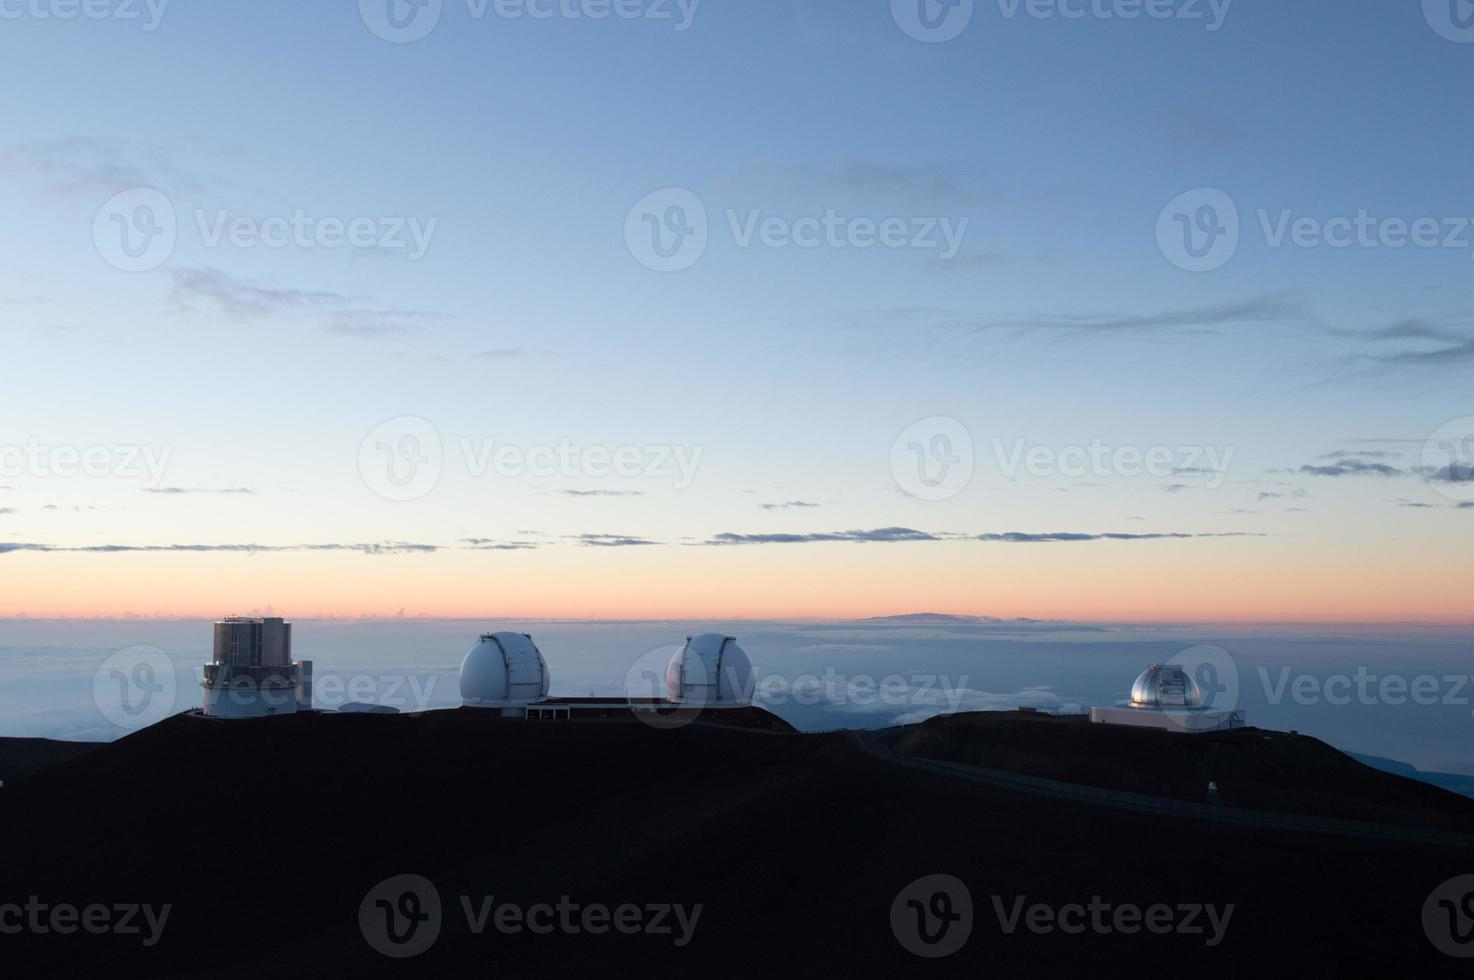 telescopio spaziale gigante hawaii foto